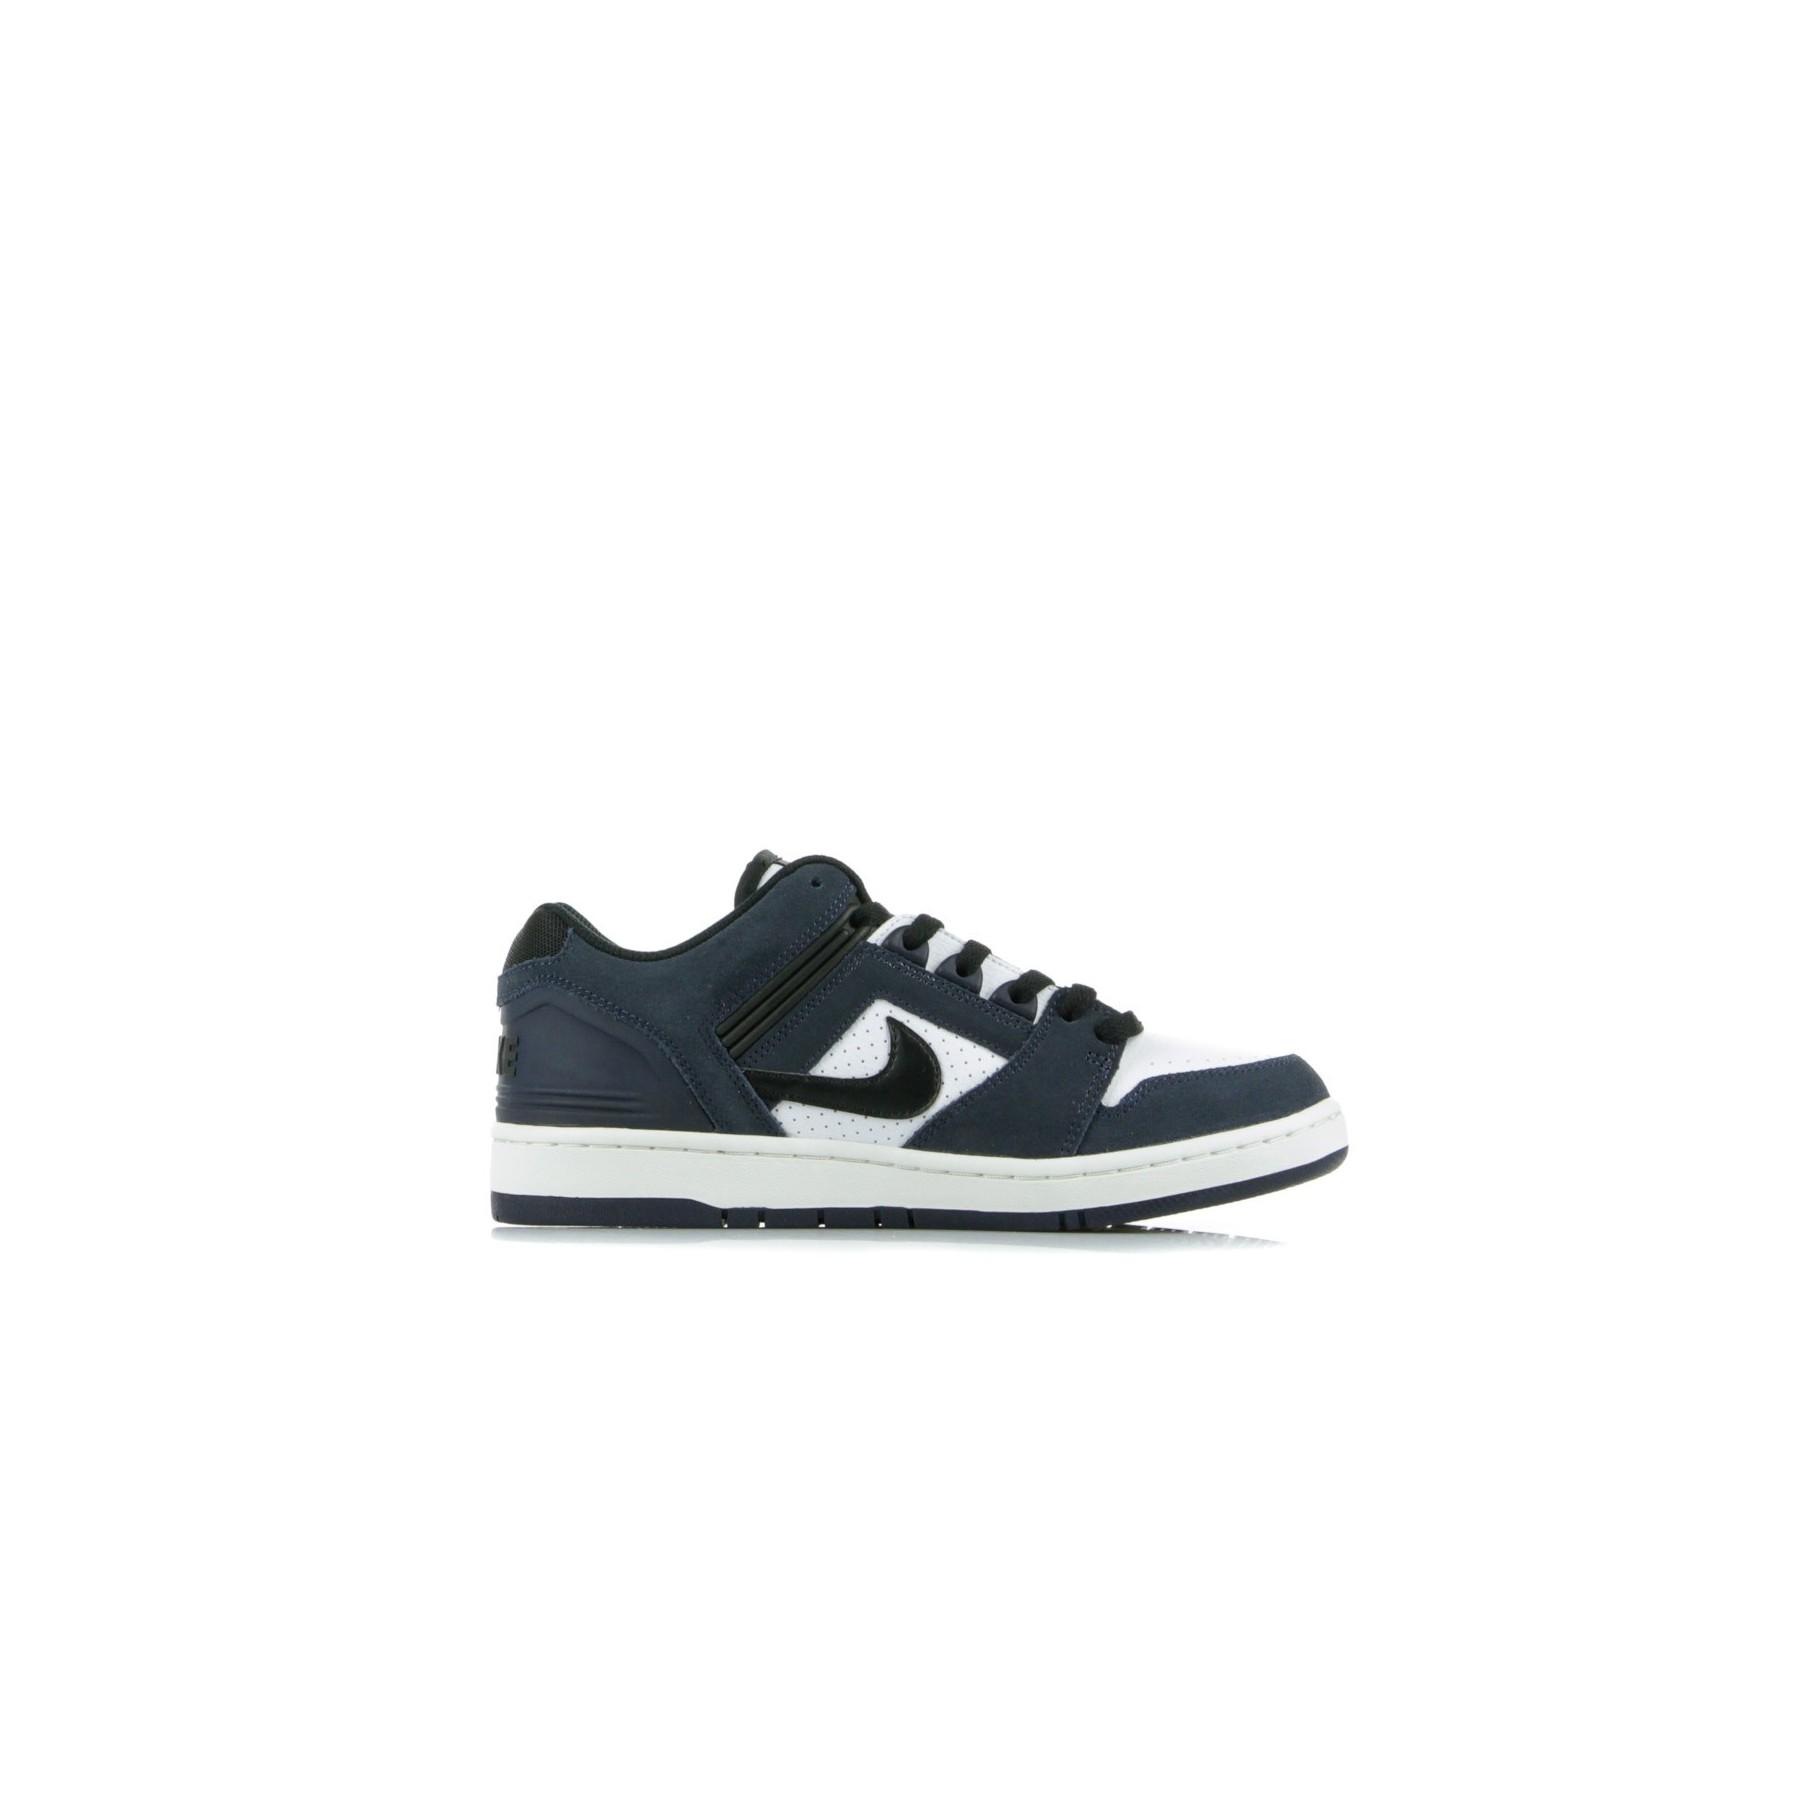 Nike SB Air Force II Low Skate Shoes ObsidianBlack White Celestial